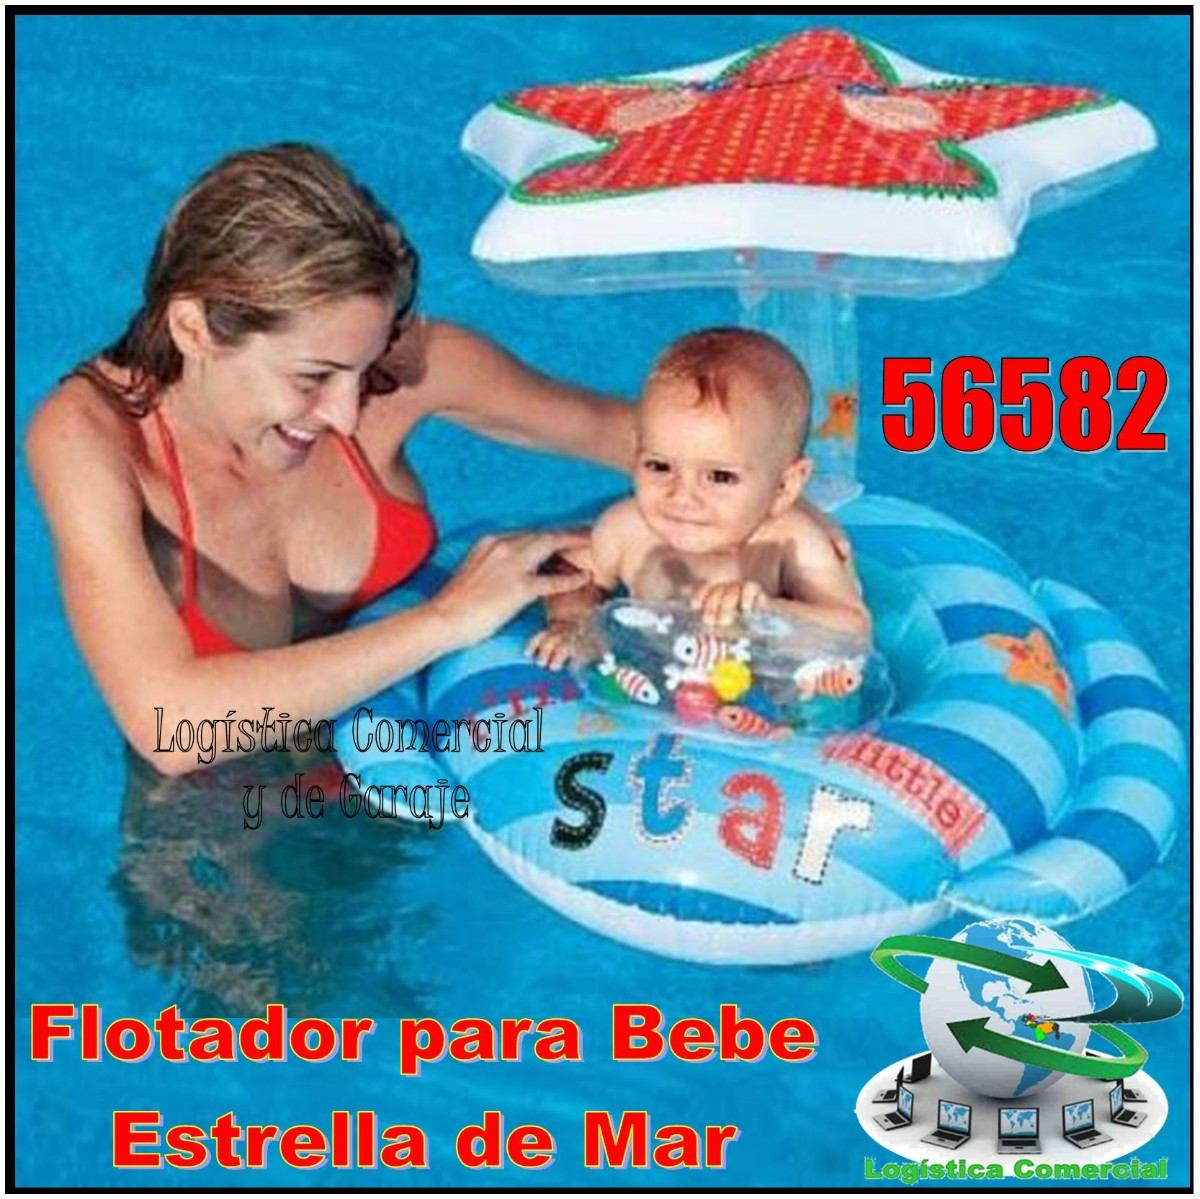 Flotador inflable para bebe con parasol estrella intex for Piscina inflable intex para bebe